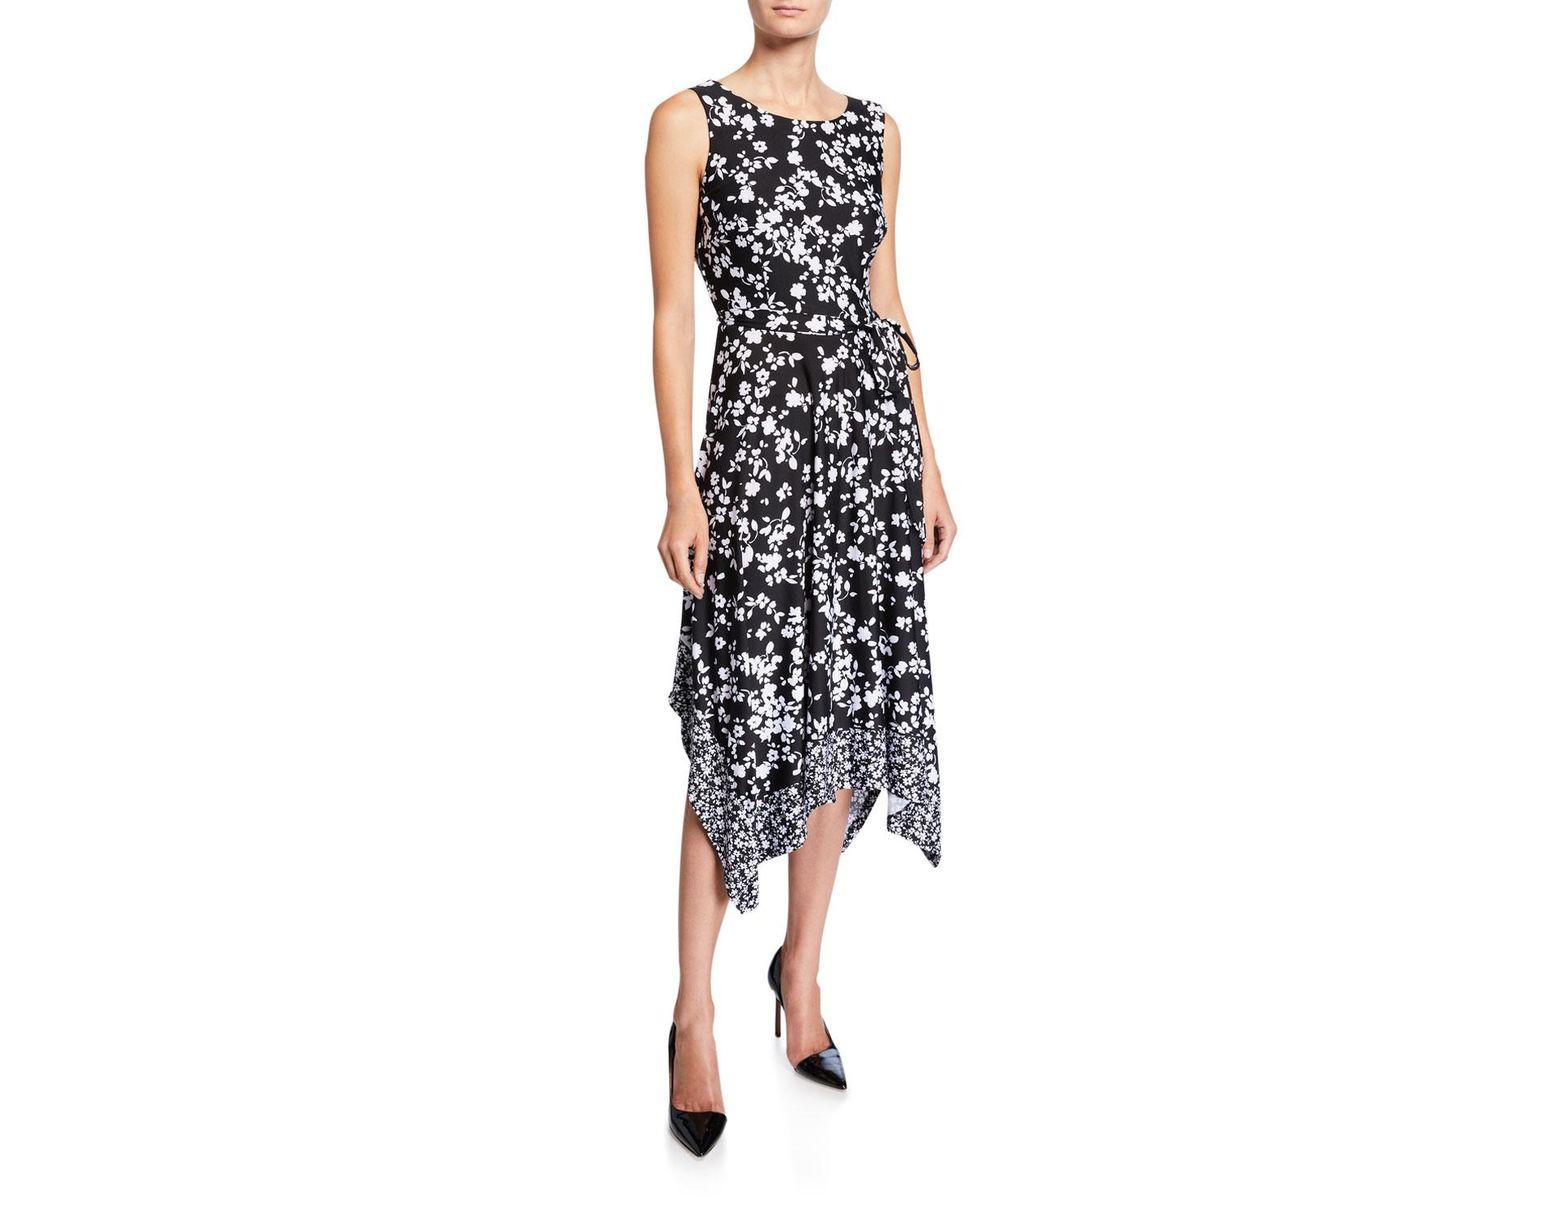 666c3120a035 Chetta B Floral-print Handkerchief Dress in Black - Lyst